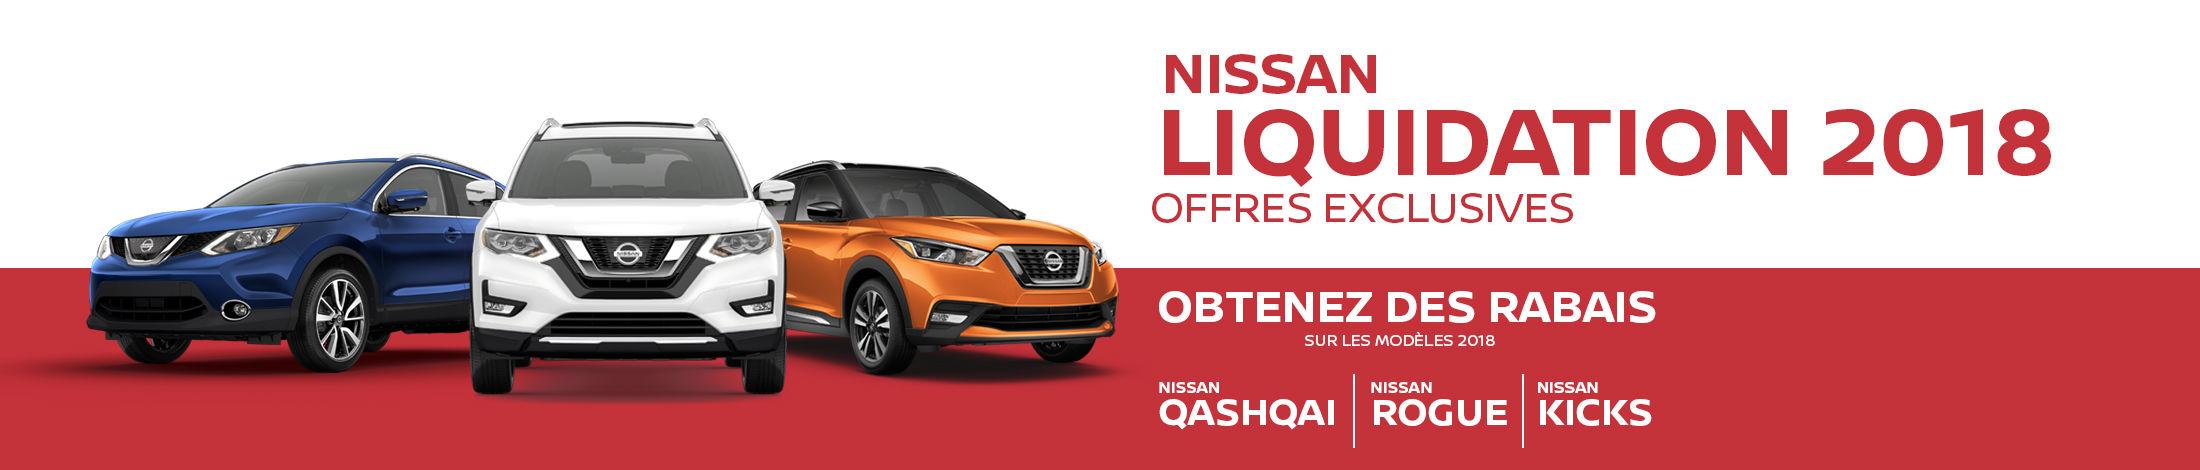 Nissan Liquidation 2018